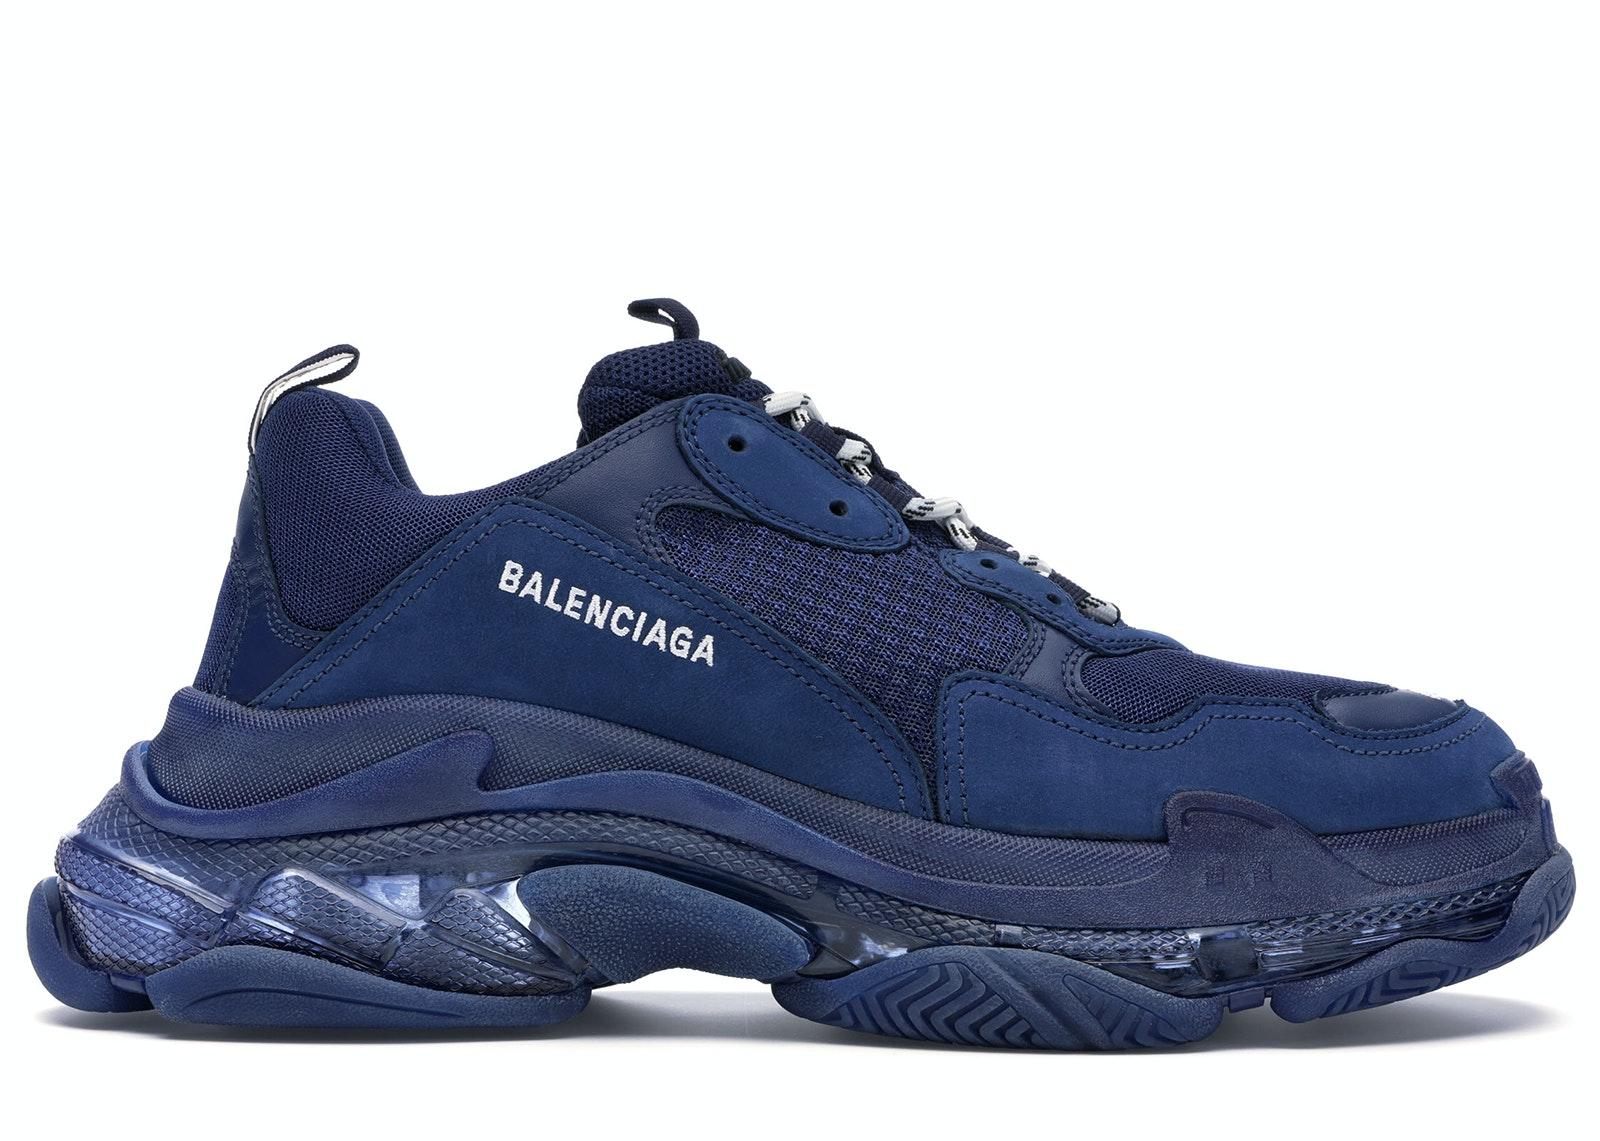 Balenciaga 10 Triple S Clear Sole Sneakers Grailed